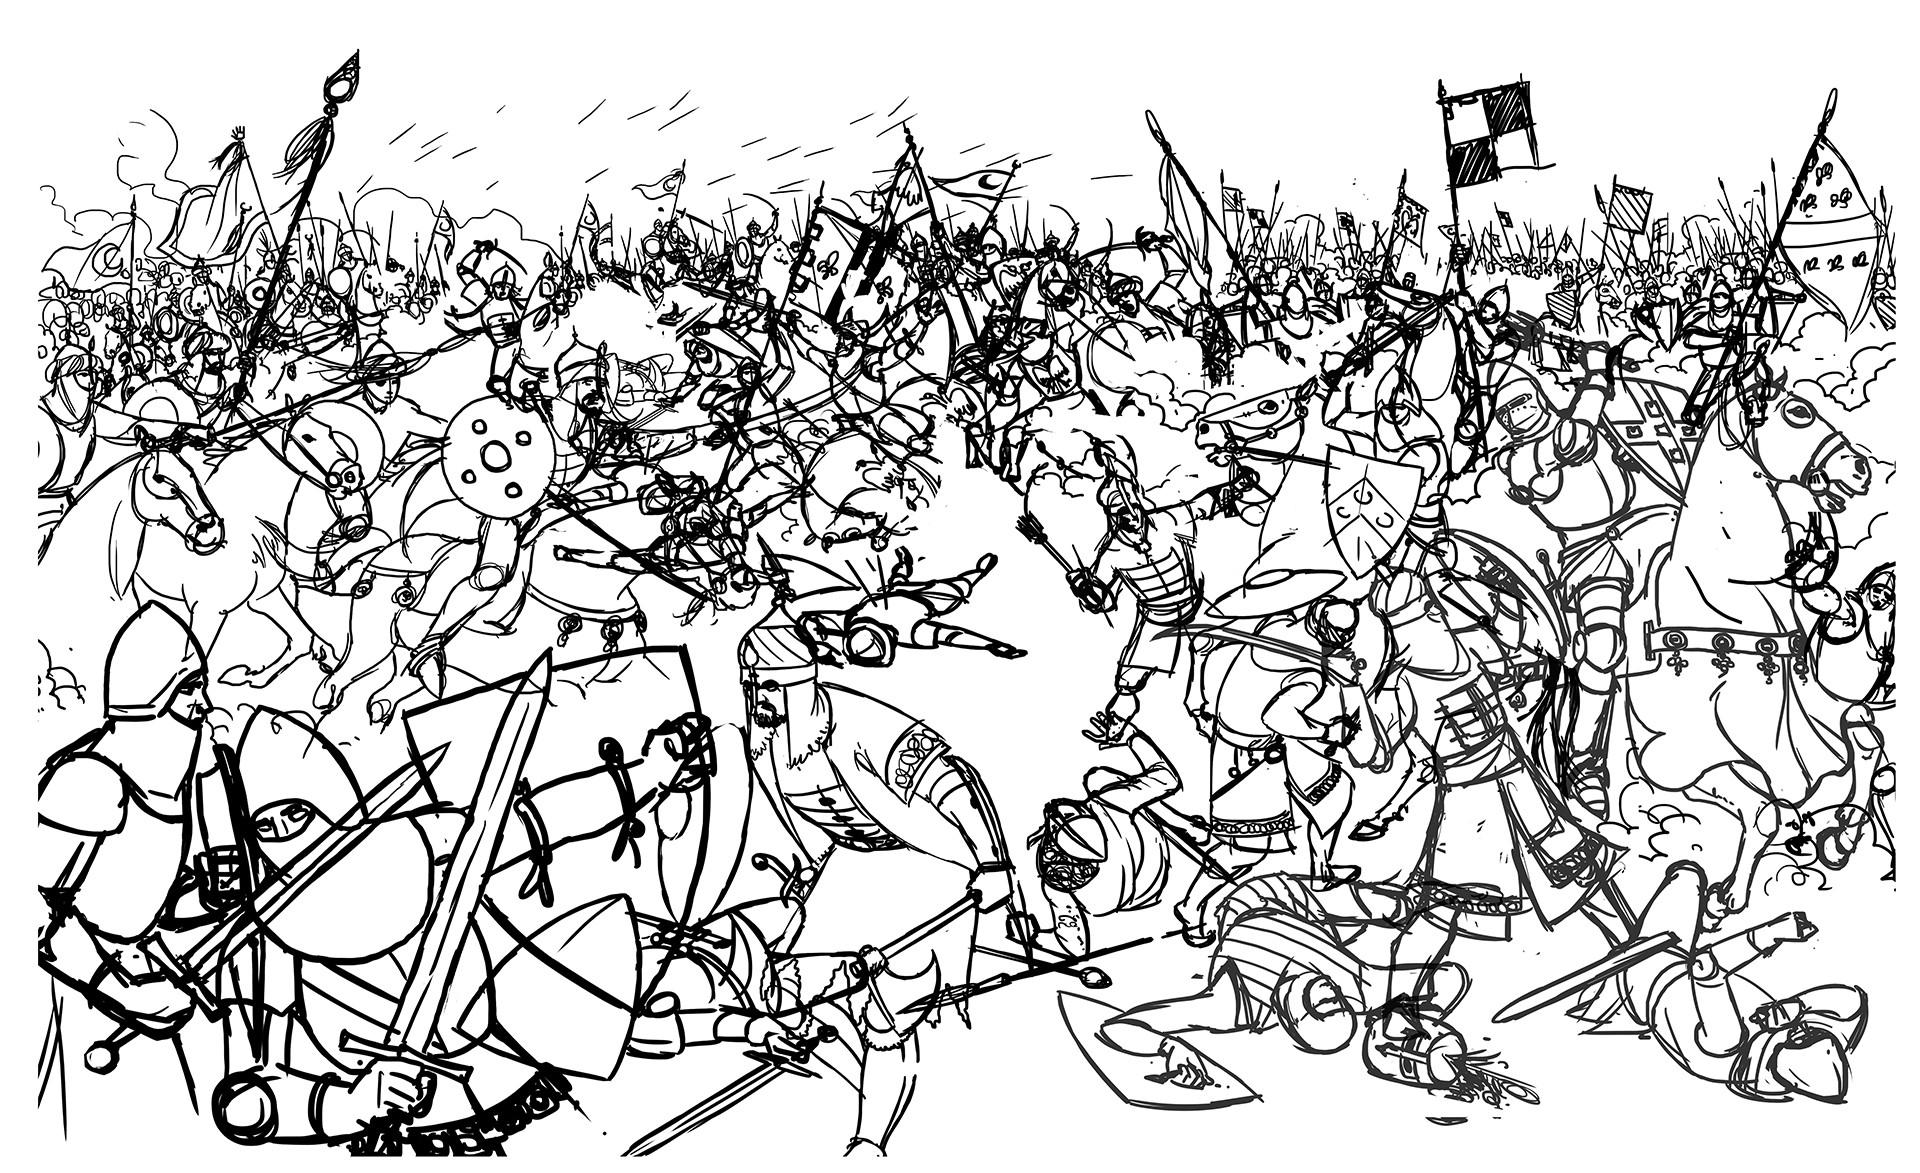 ArtStation - Medieval battles; historical illustration, Emir Durmisevic